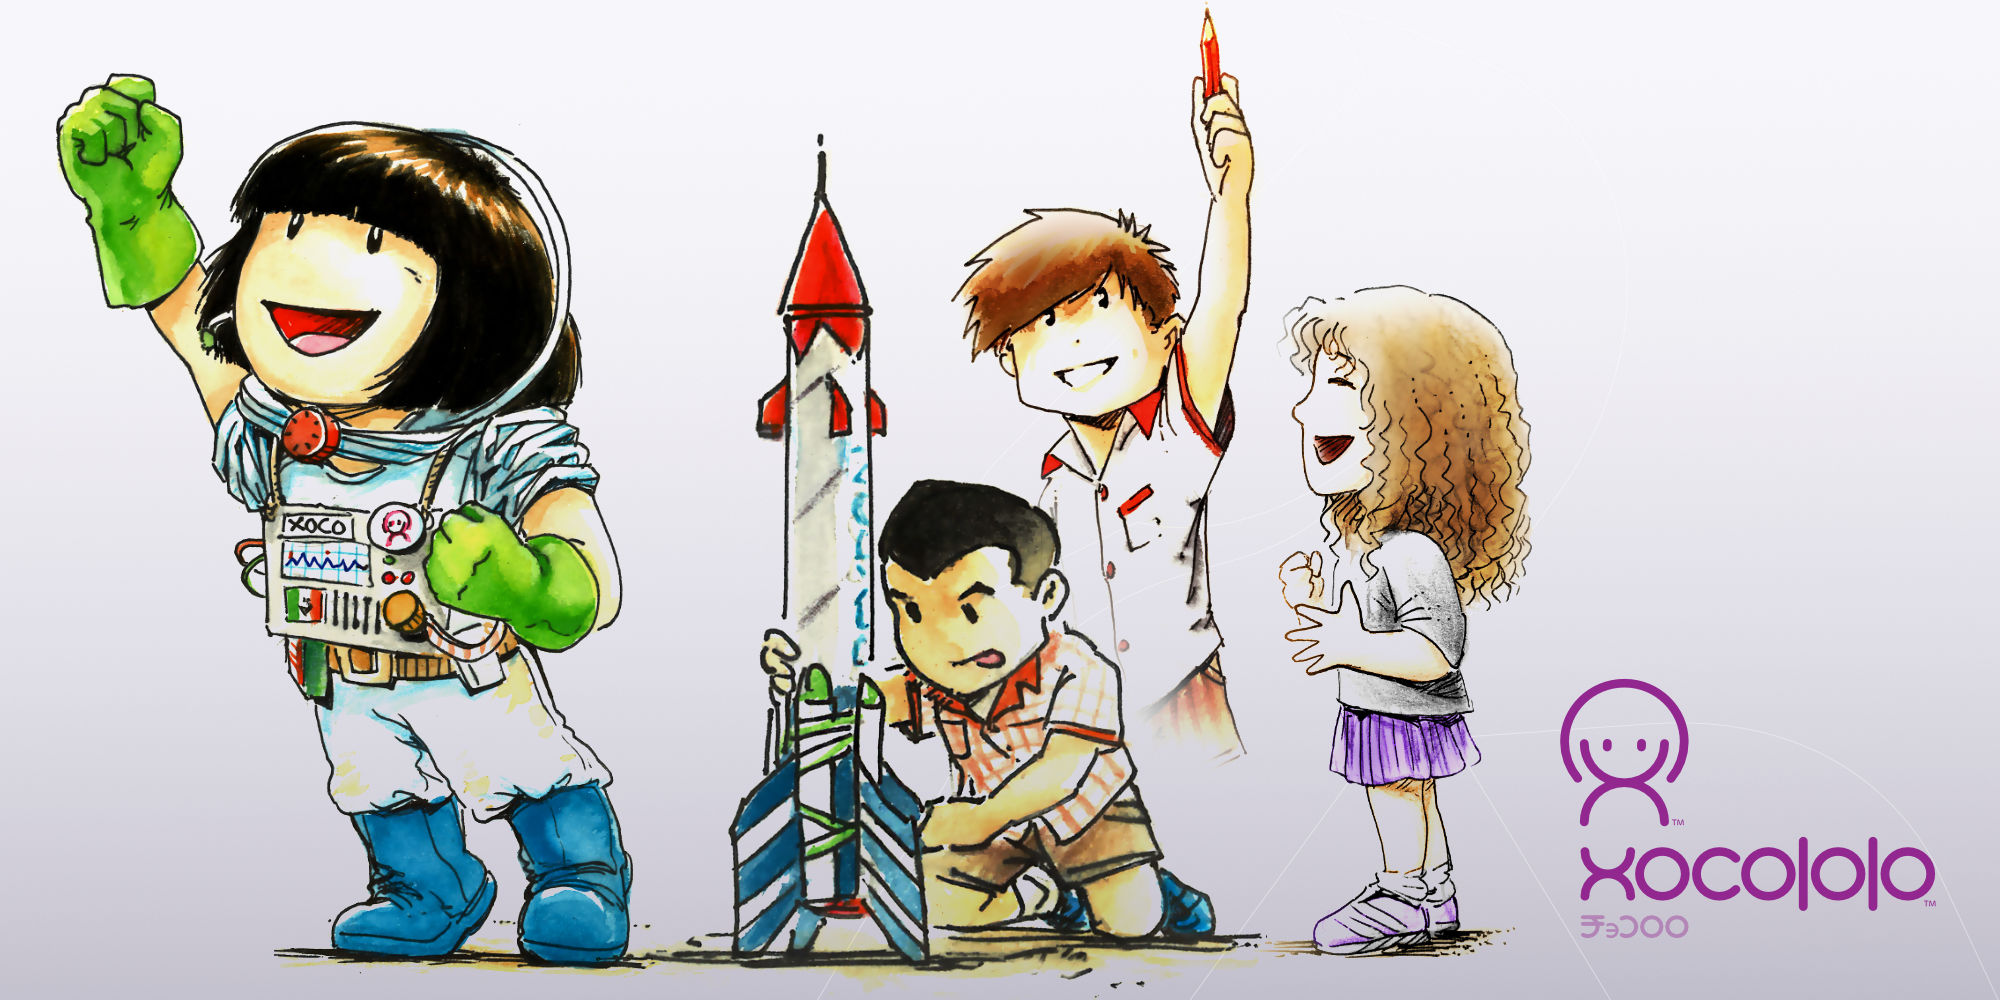 Xocololo children series by Hakubashi